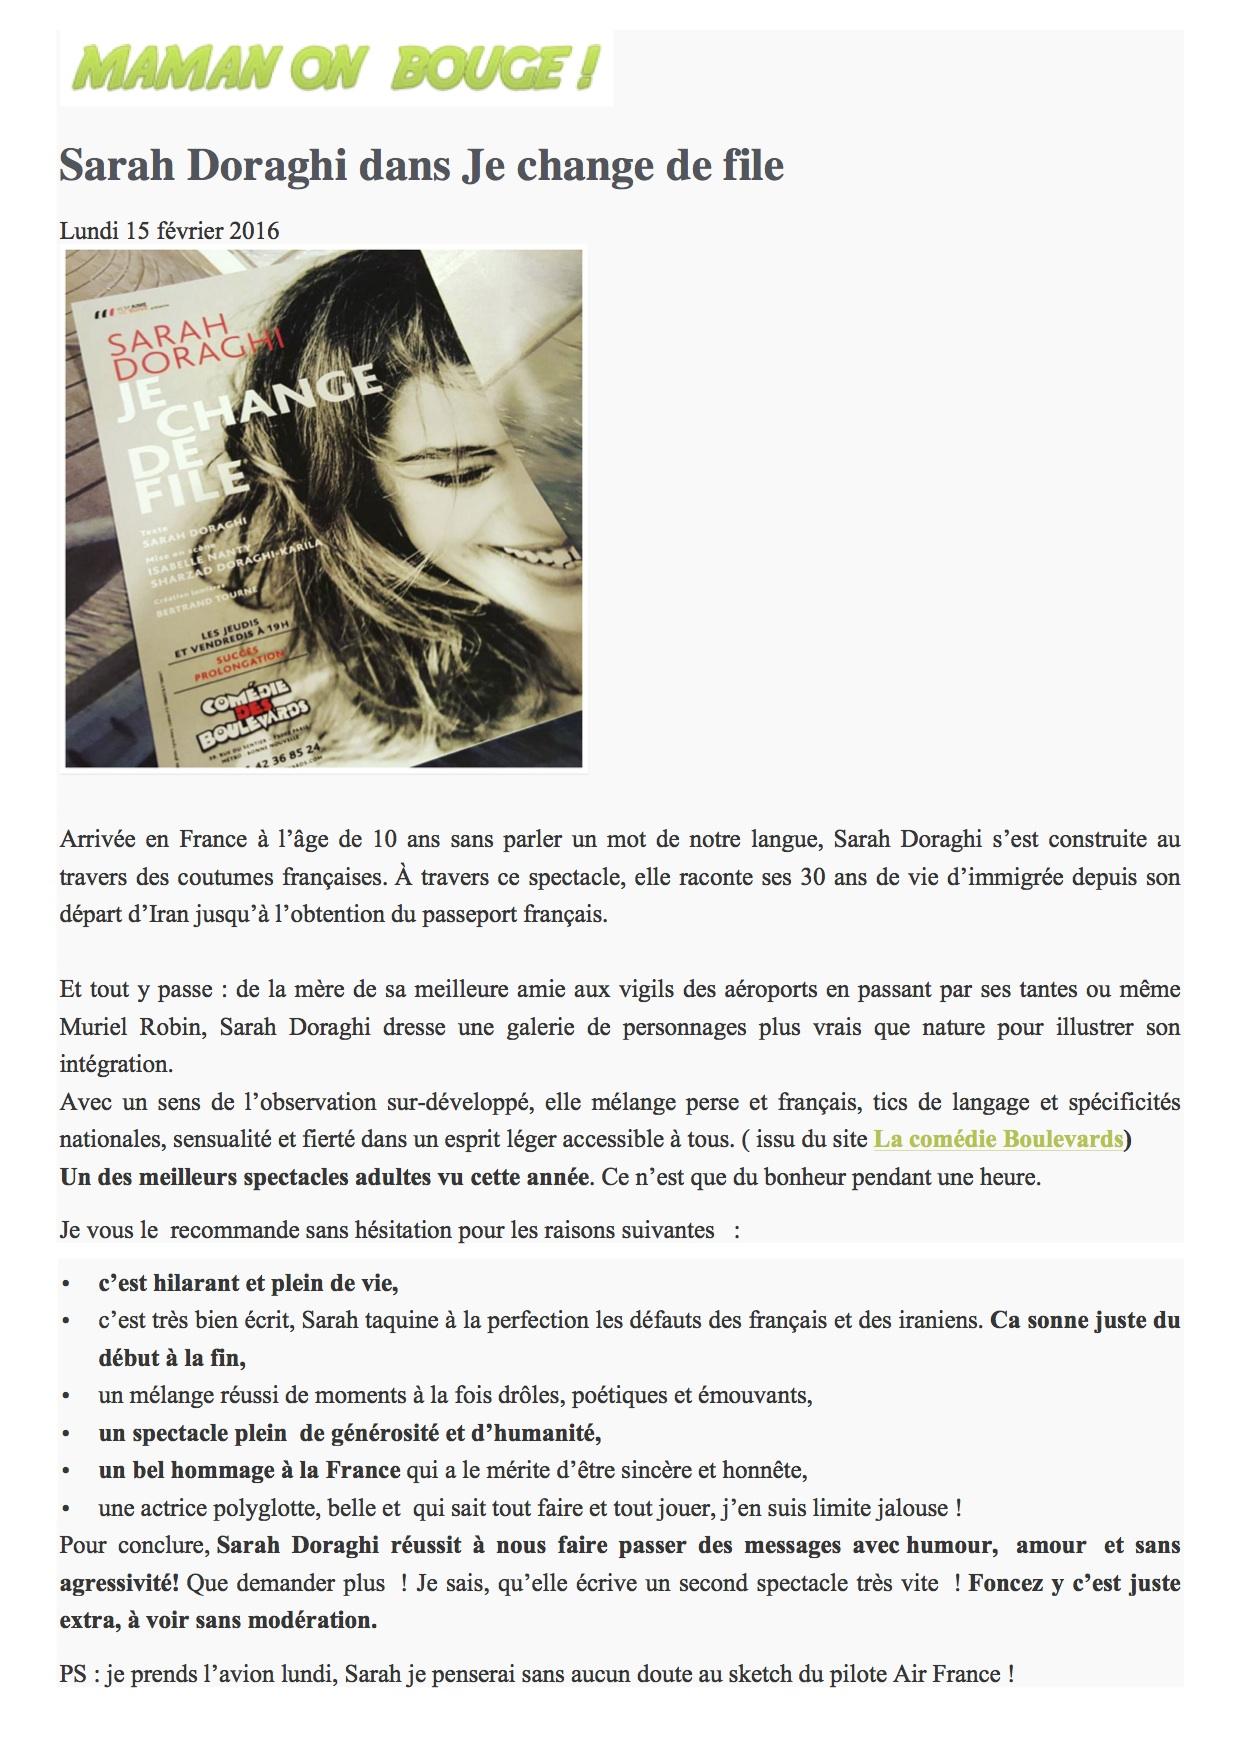 Mamanonbouge.com 15.02.16